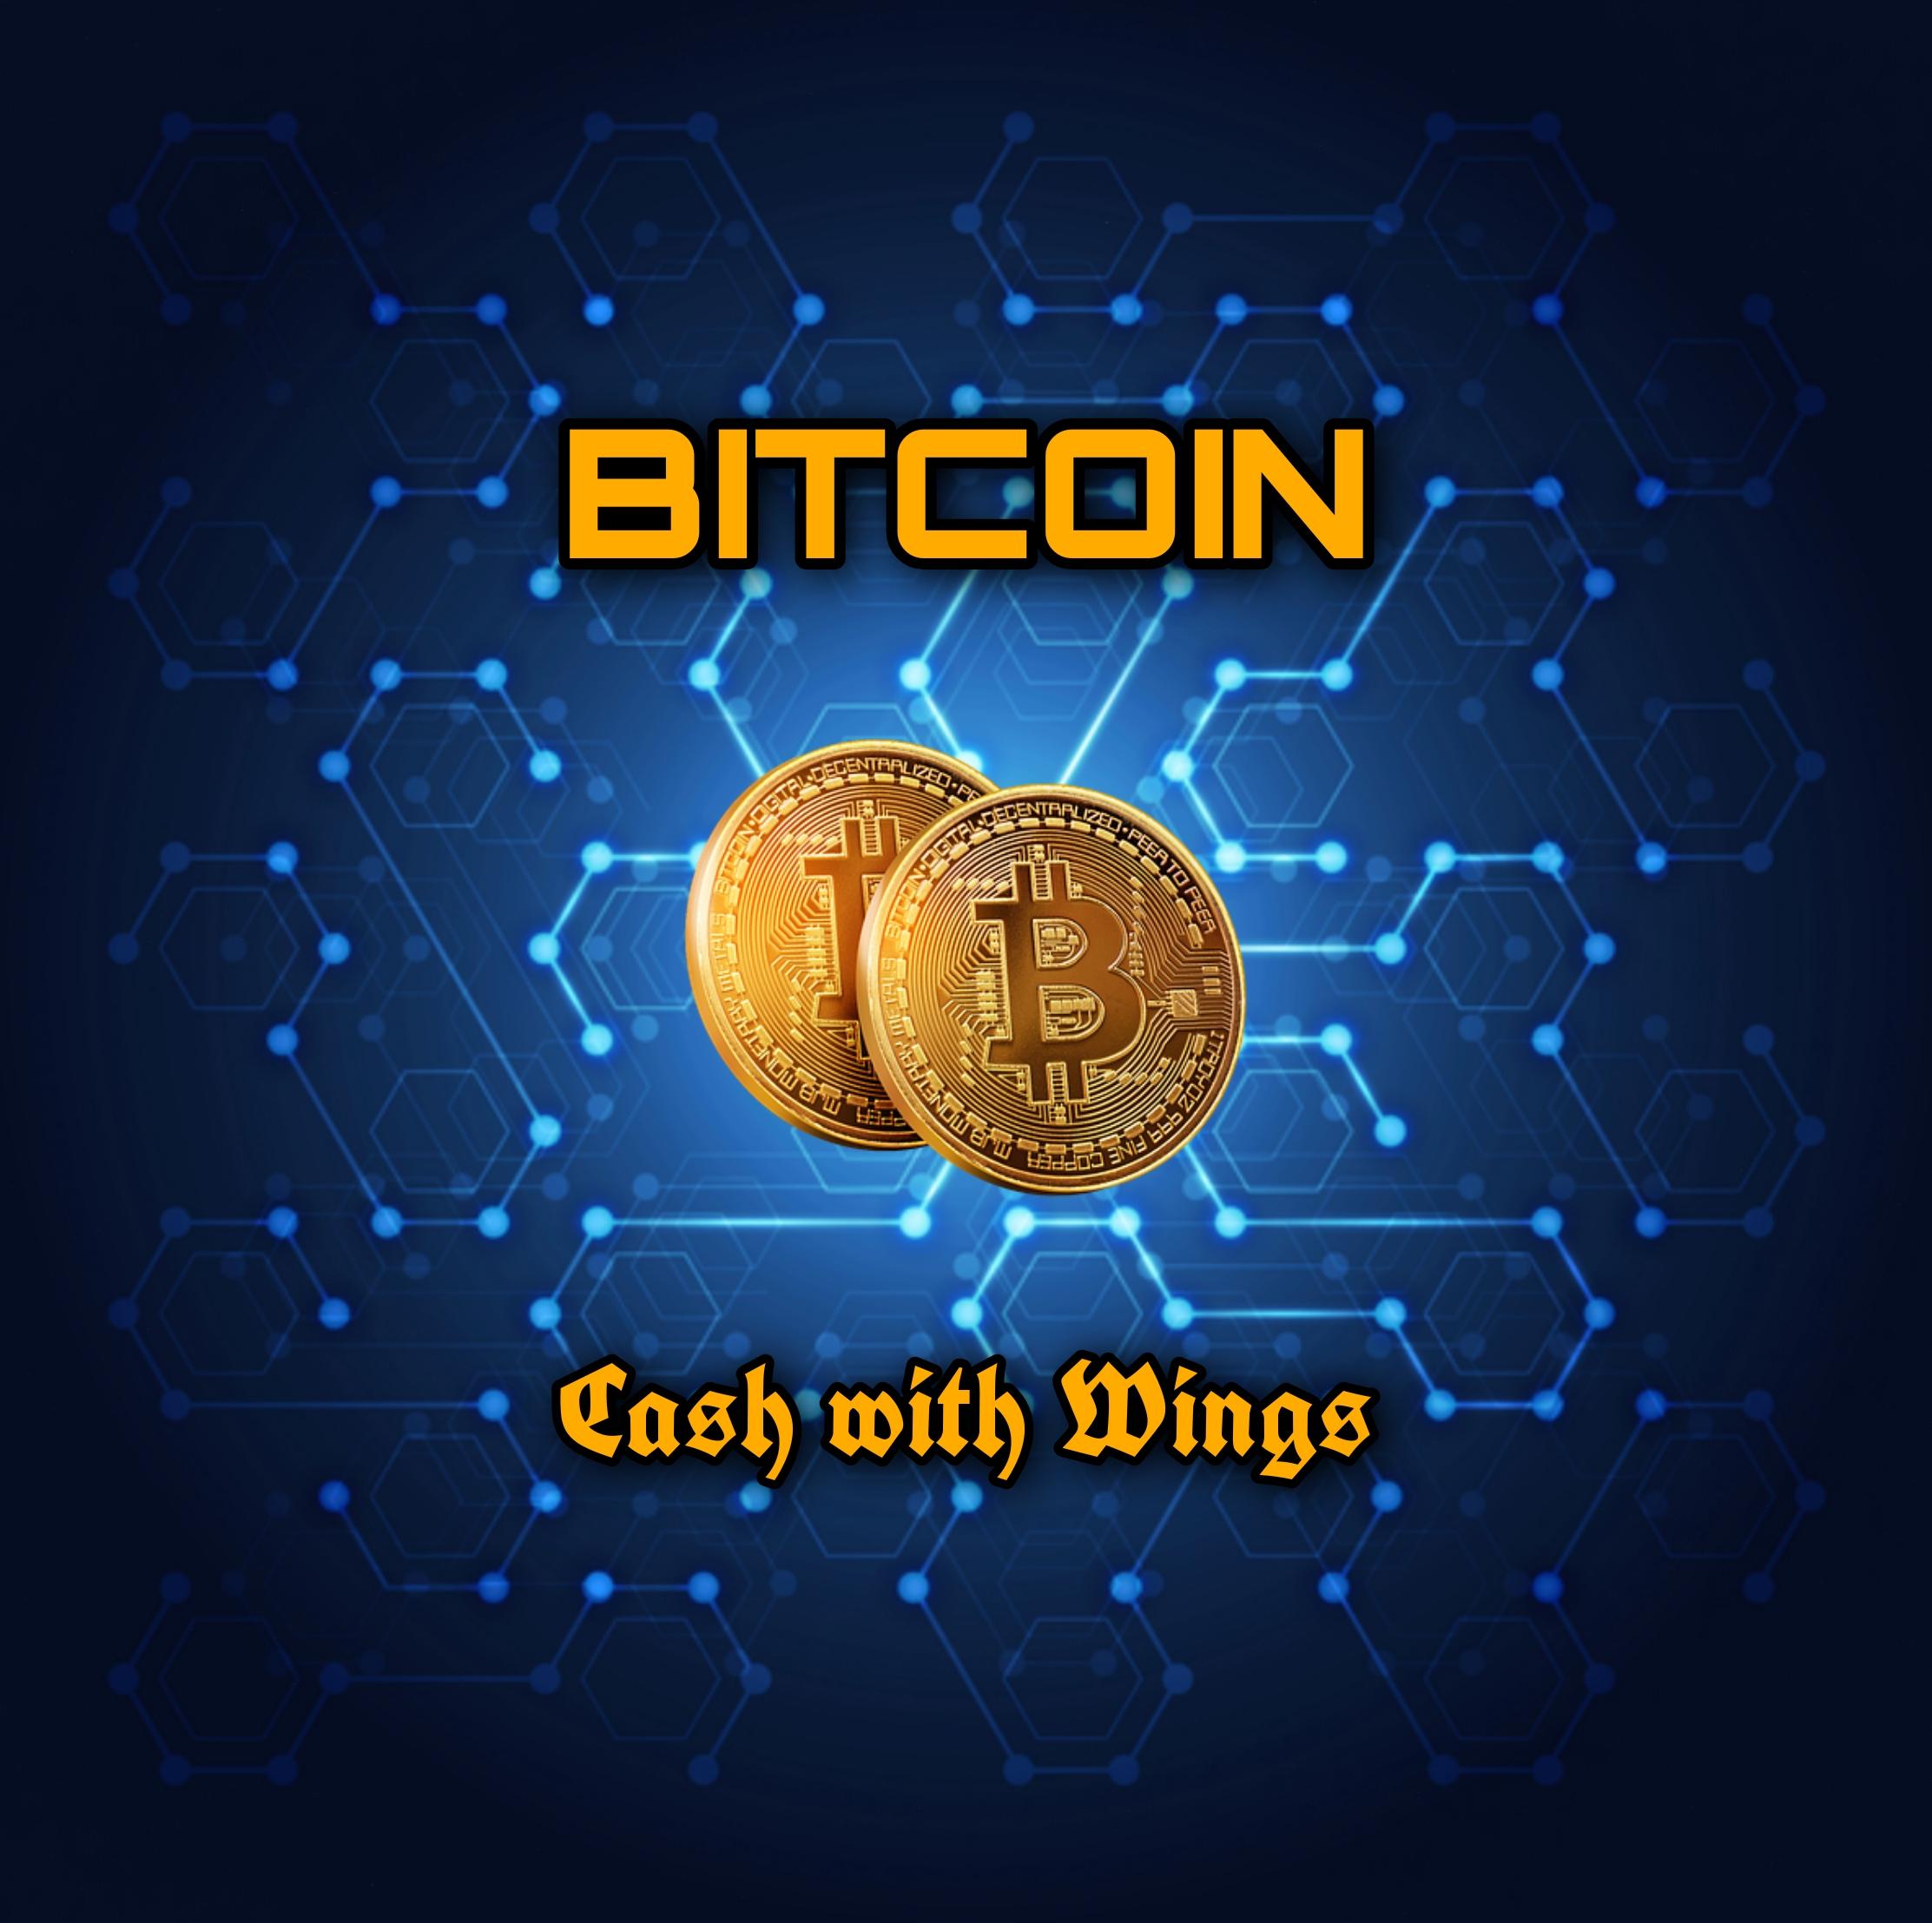 Illustration of a bitcoin